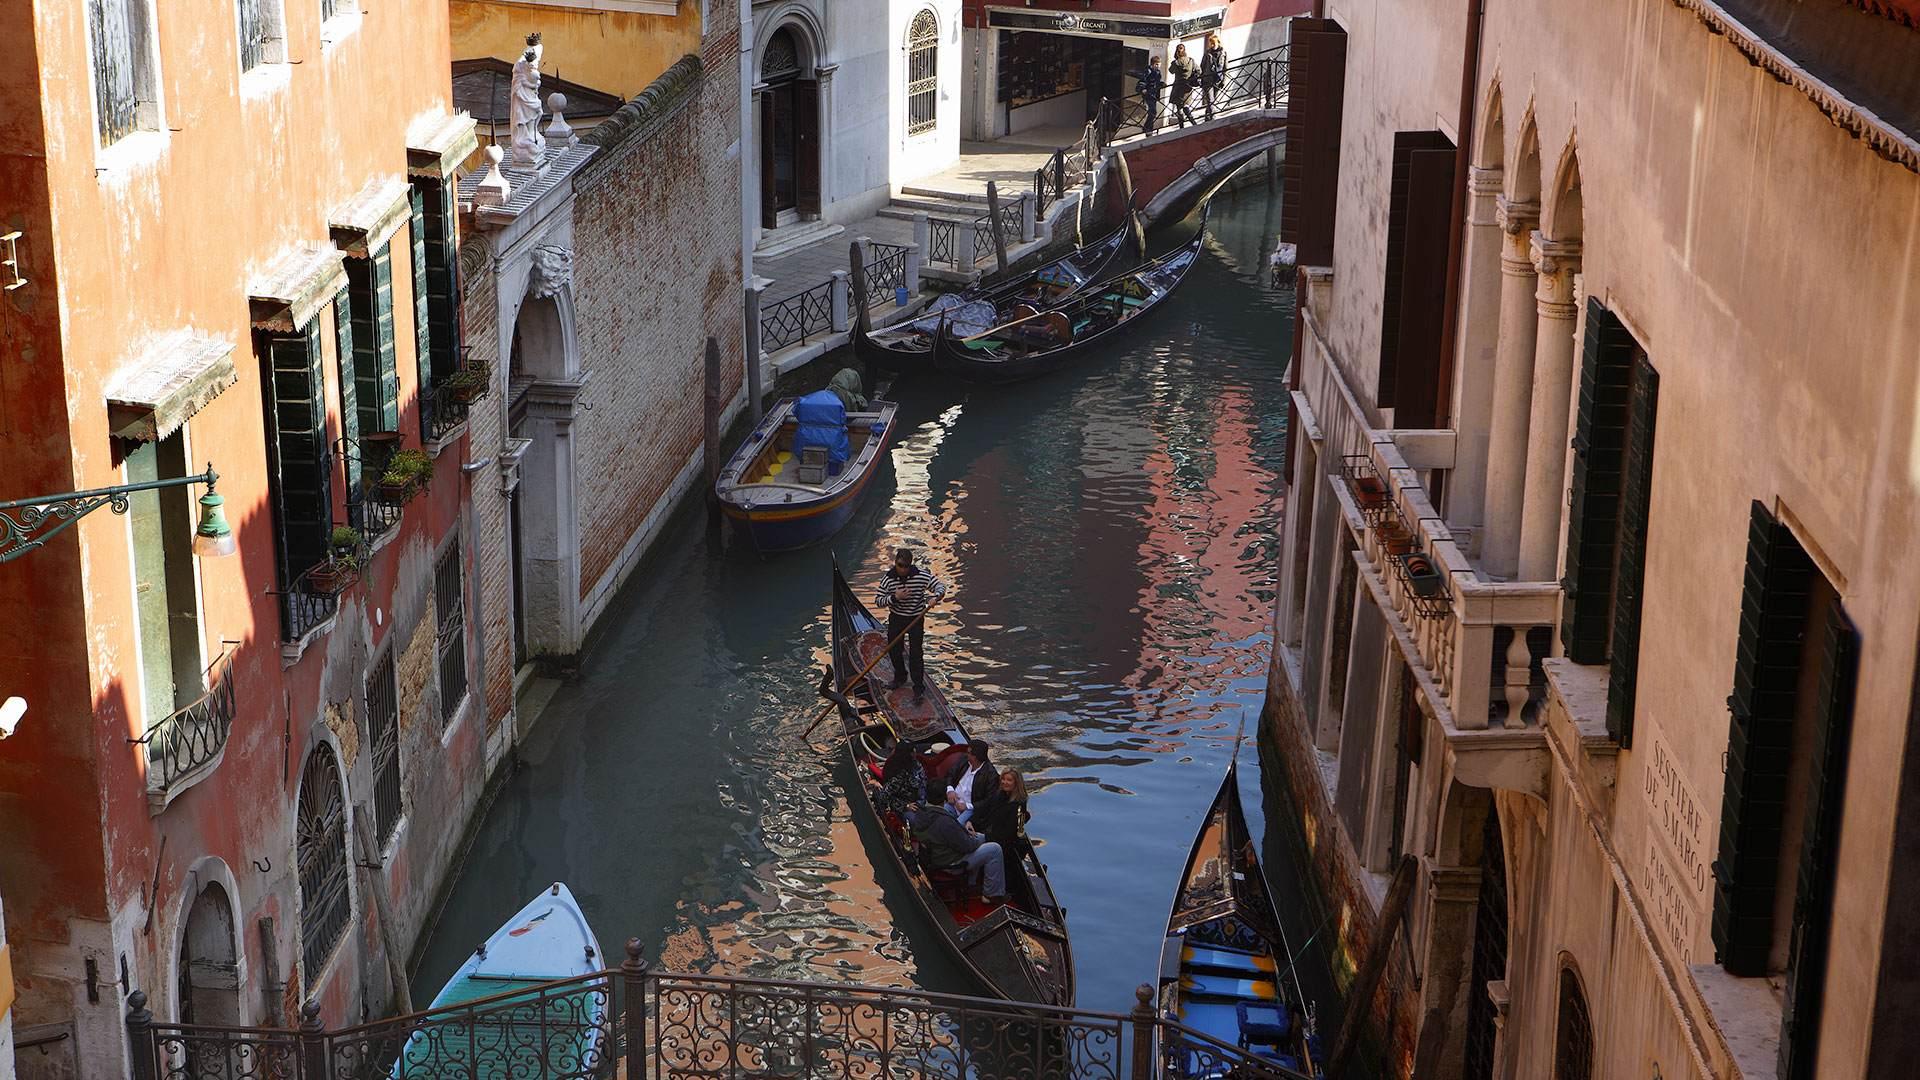 Venice Luxury Hotel Hotel Aqua Palace Official Site 4 Star Hotel